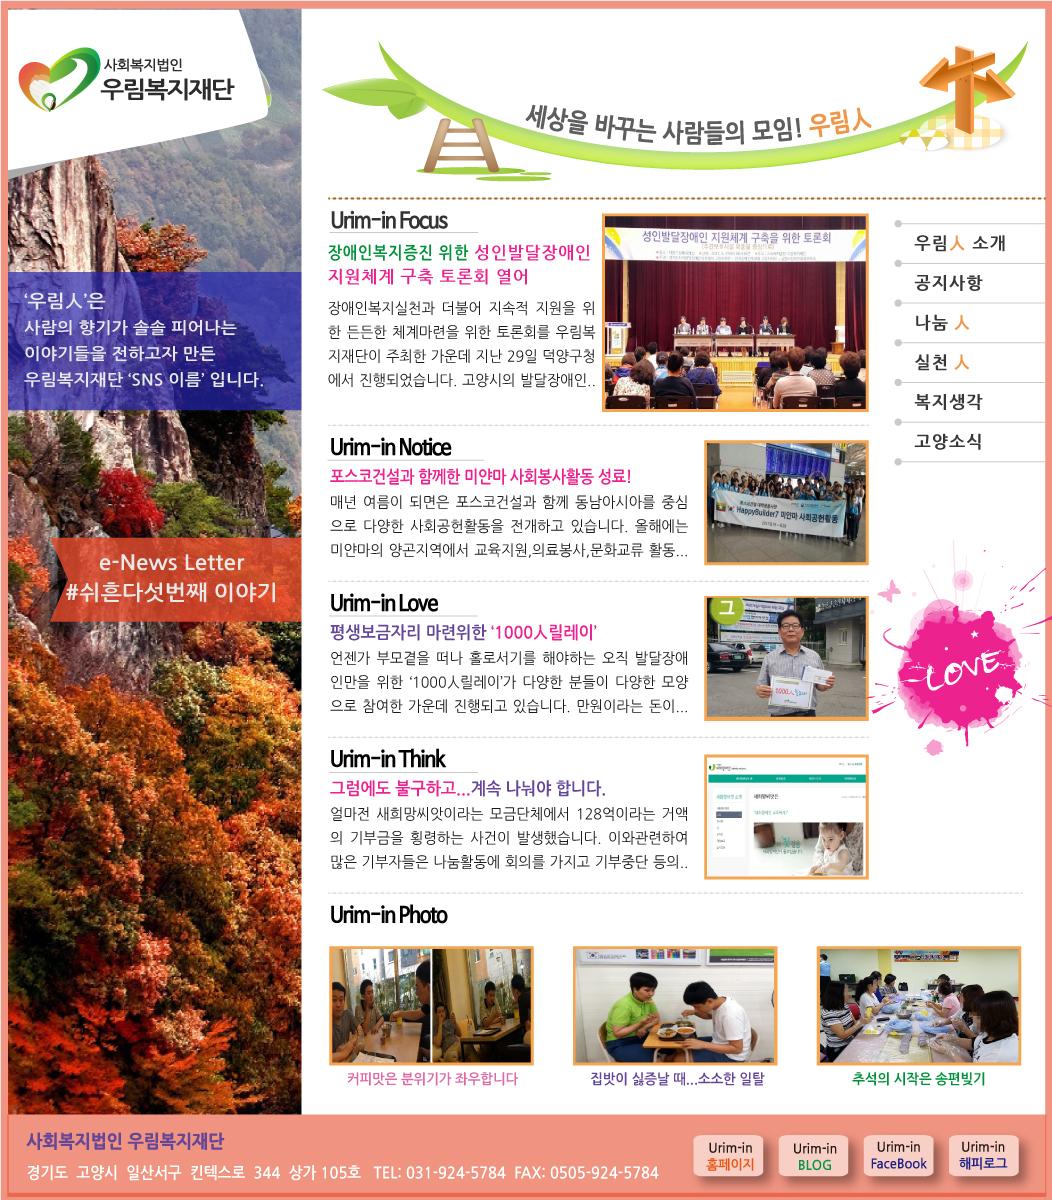 webzine_urimin_54.jpg